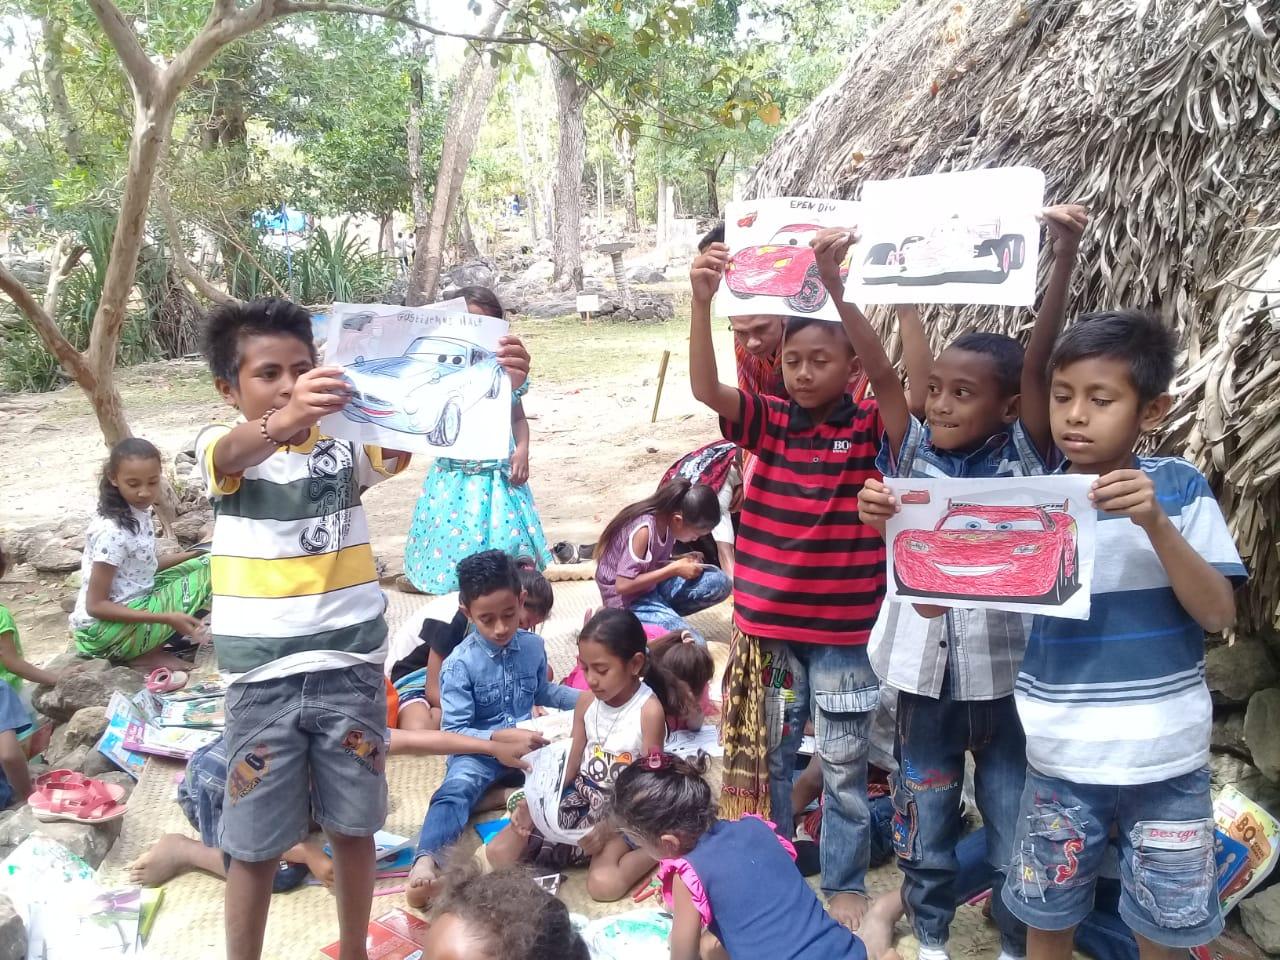 Keceriaan anak-anak mendapatkan buku yang dibawa Zelia | Foto: Dok. PNS Inspiratif 2018